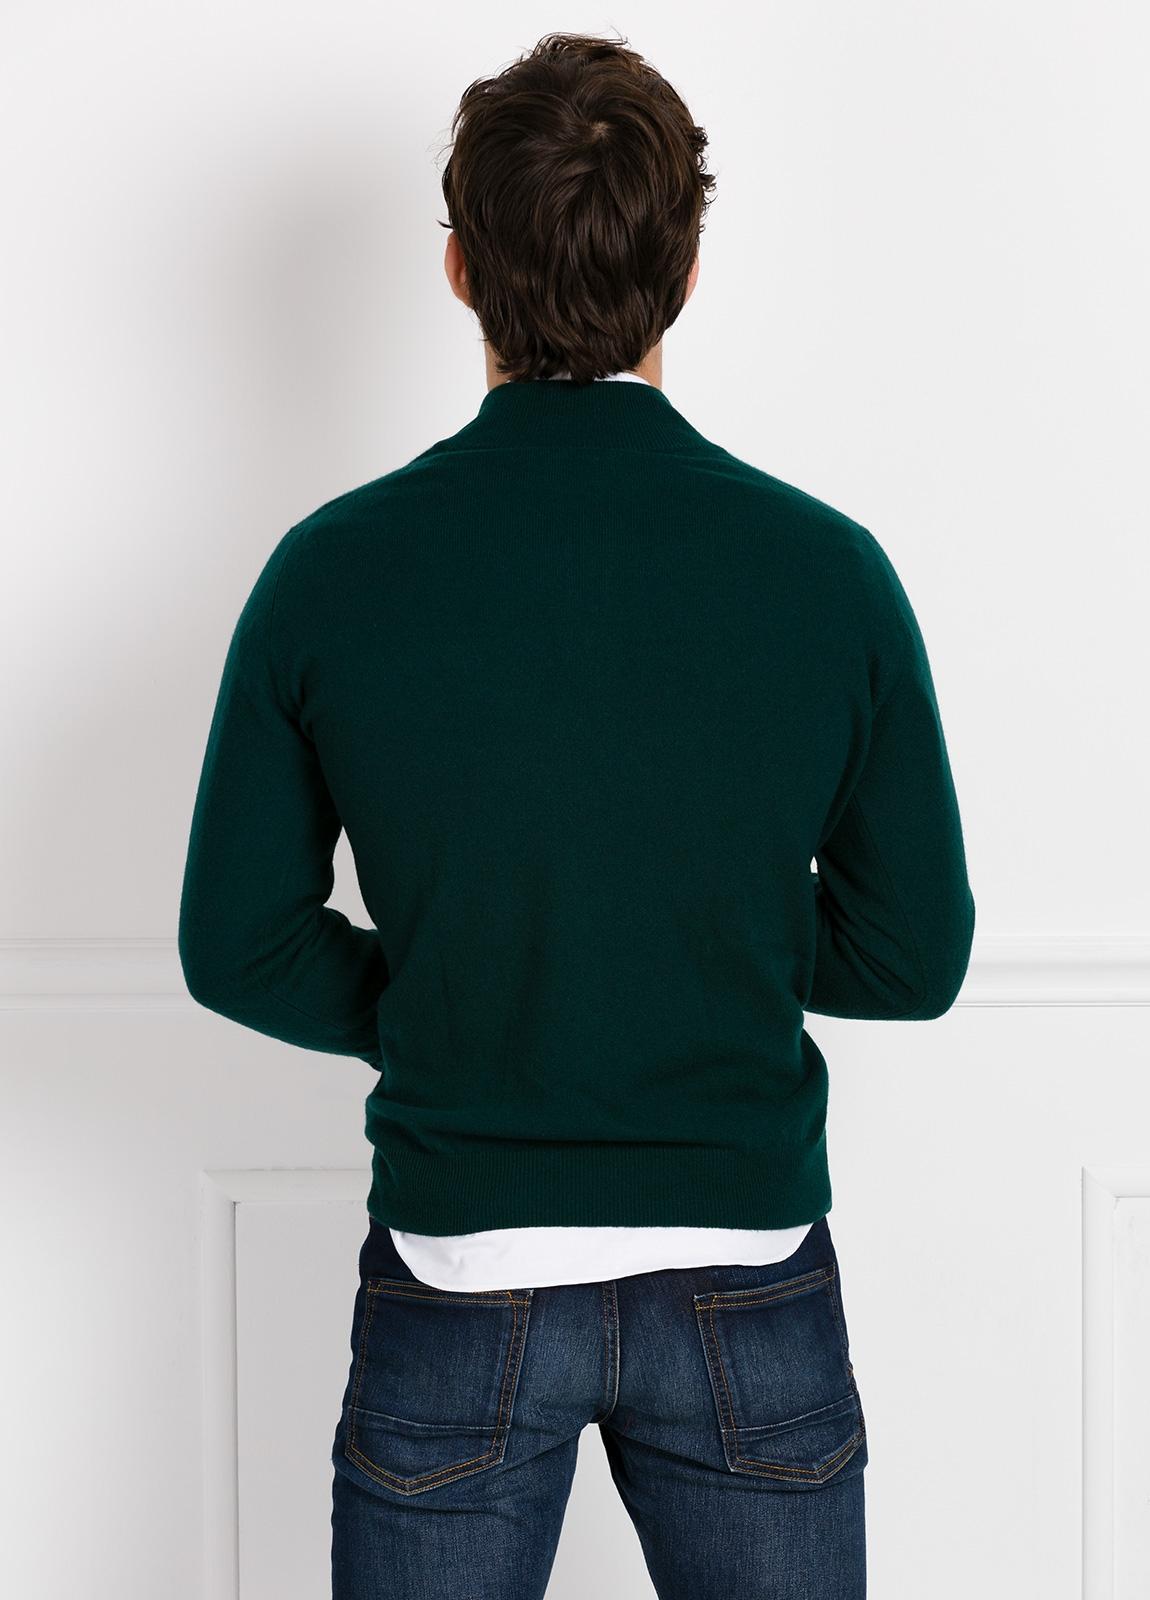 Jersey liso cuello cremallera color verde, cashmere 100%. - Ítem2